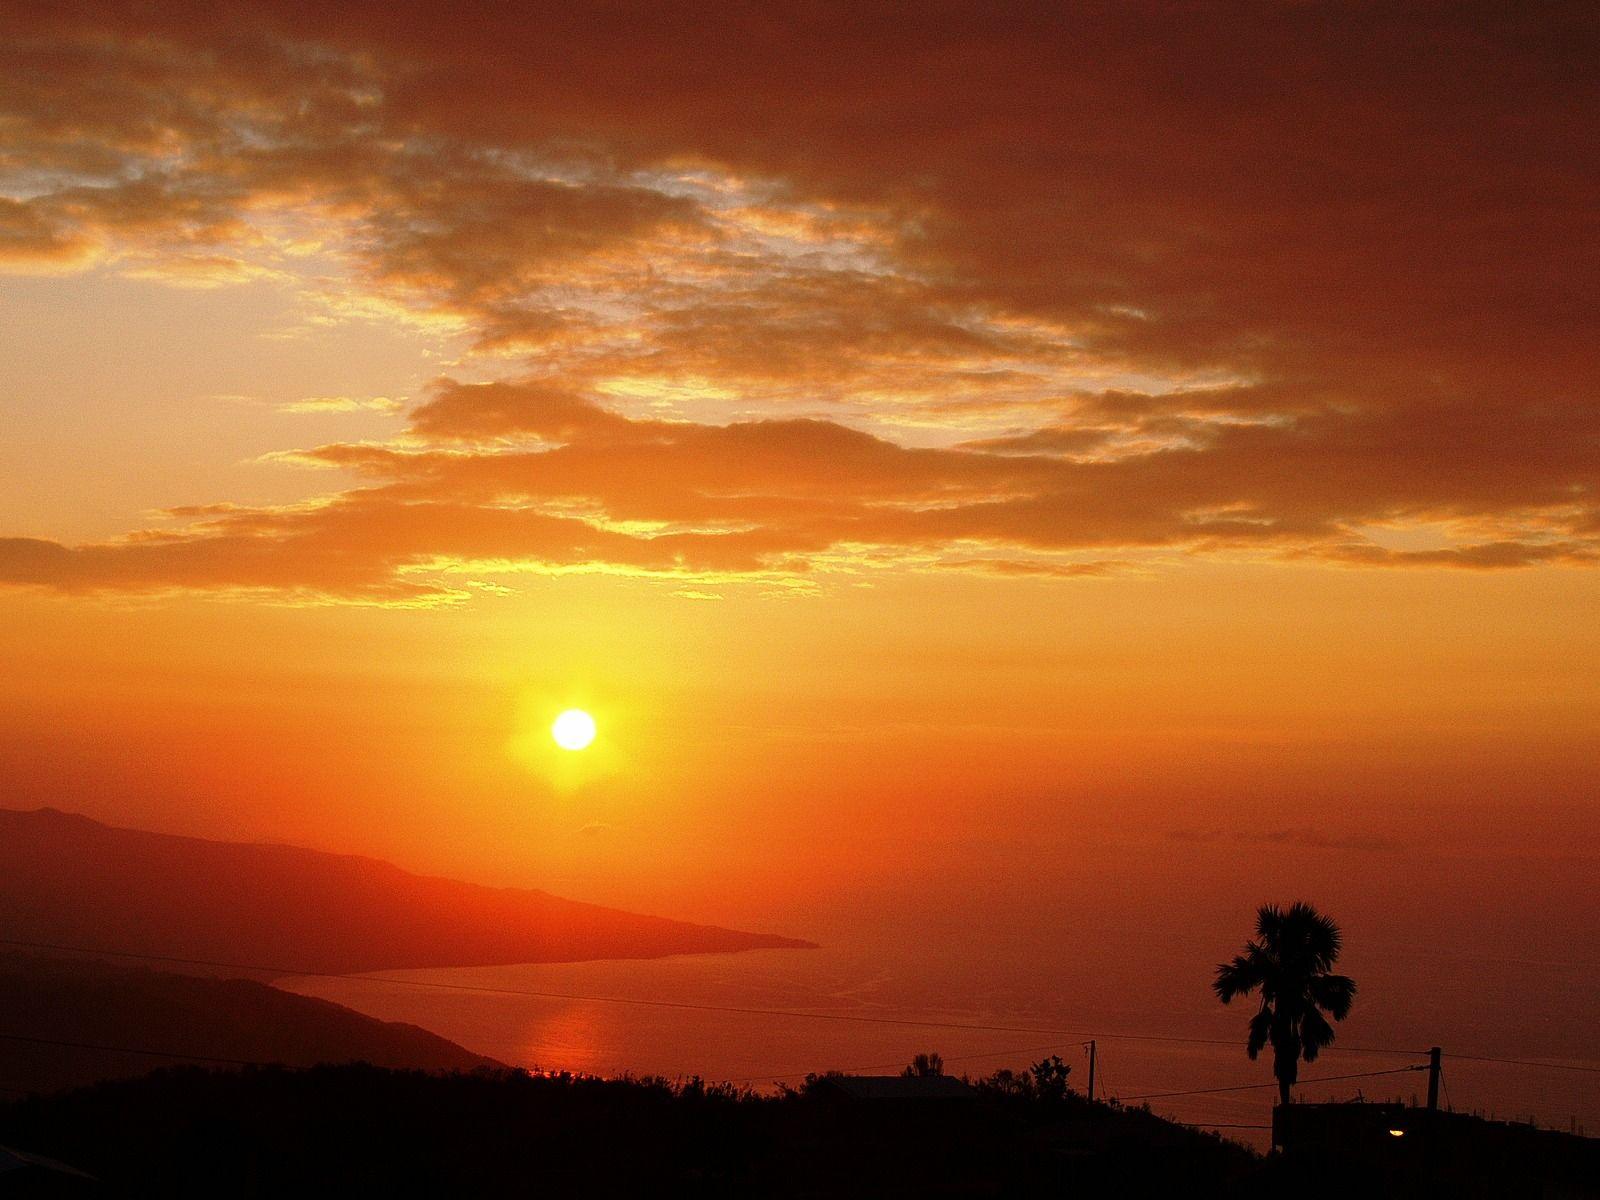 Sunrise in Jamaica - YouTube